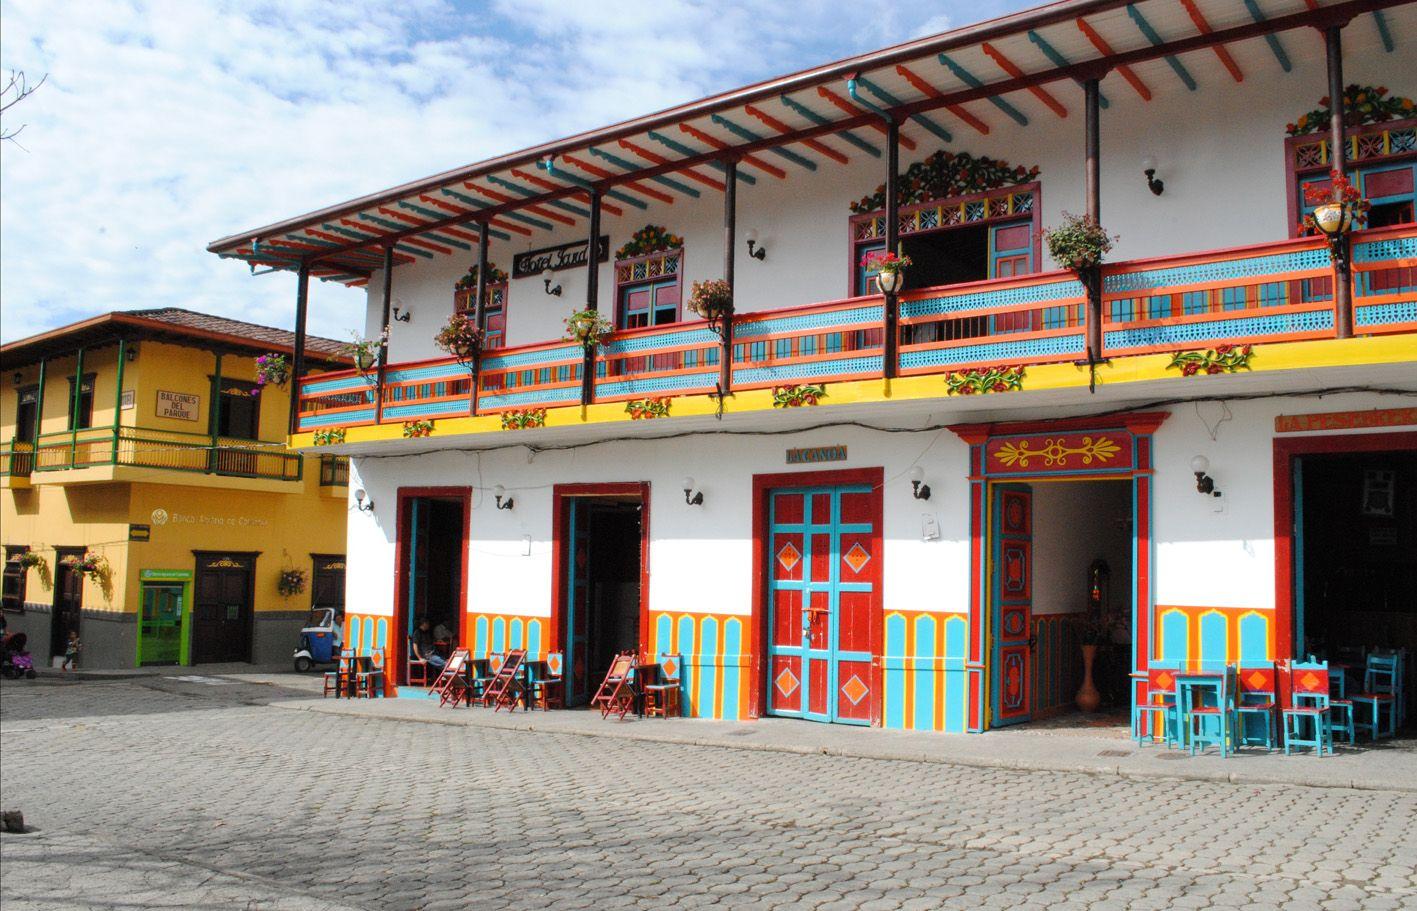 Jard n antioquia postales de colombia colombia 39 s for Jardin antioquia